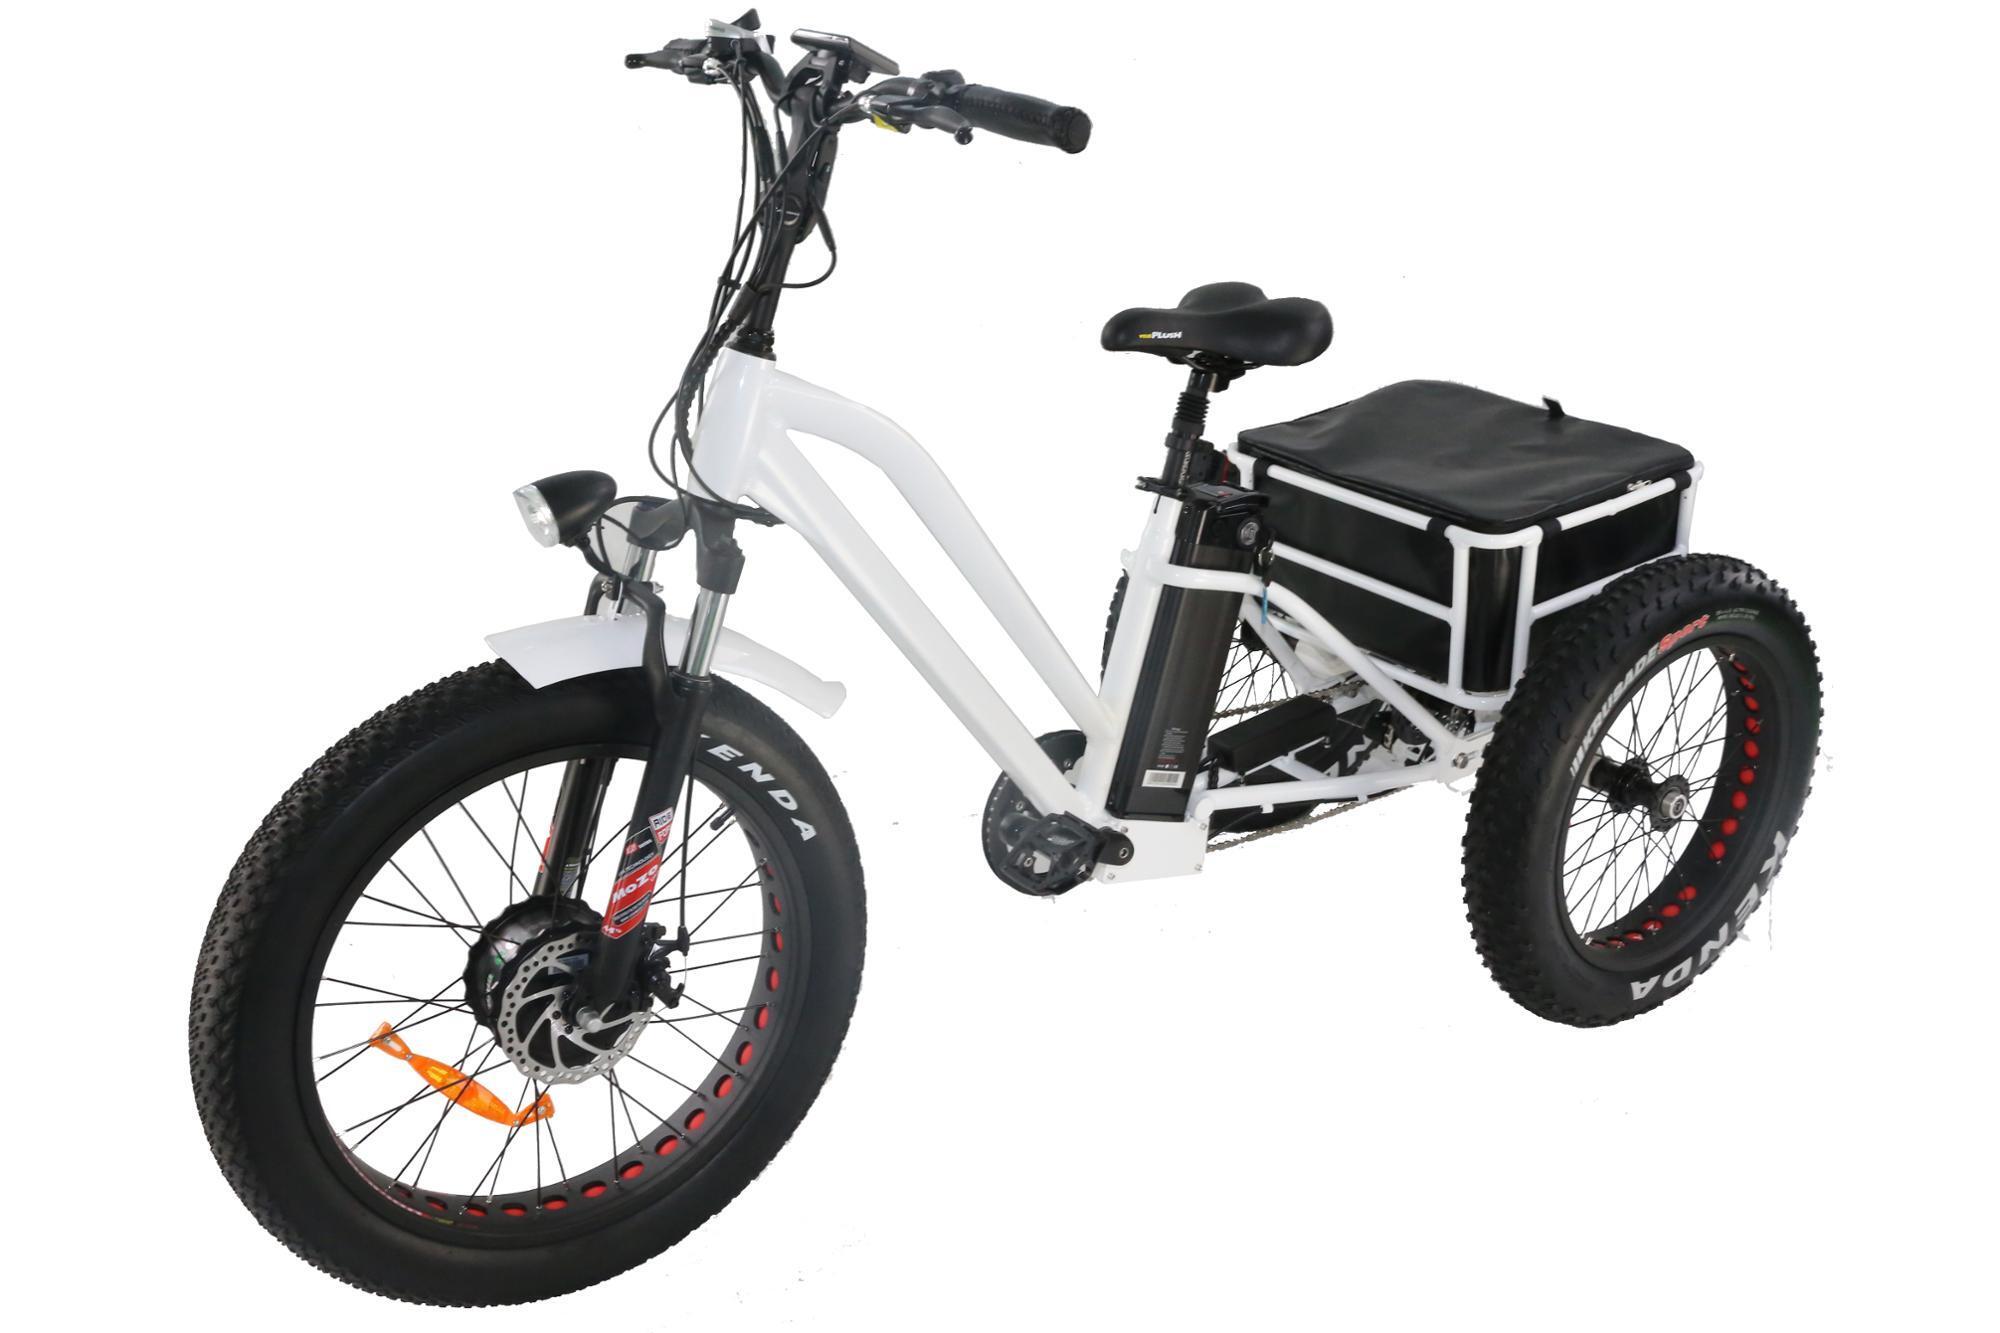 pedal assist 3 three wheel fat tire electric cargo. Black Bedroom Furniture Sets. Home Design Ideas